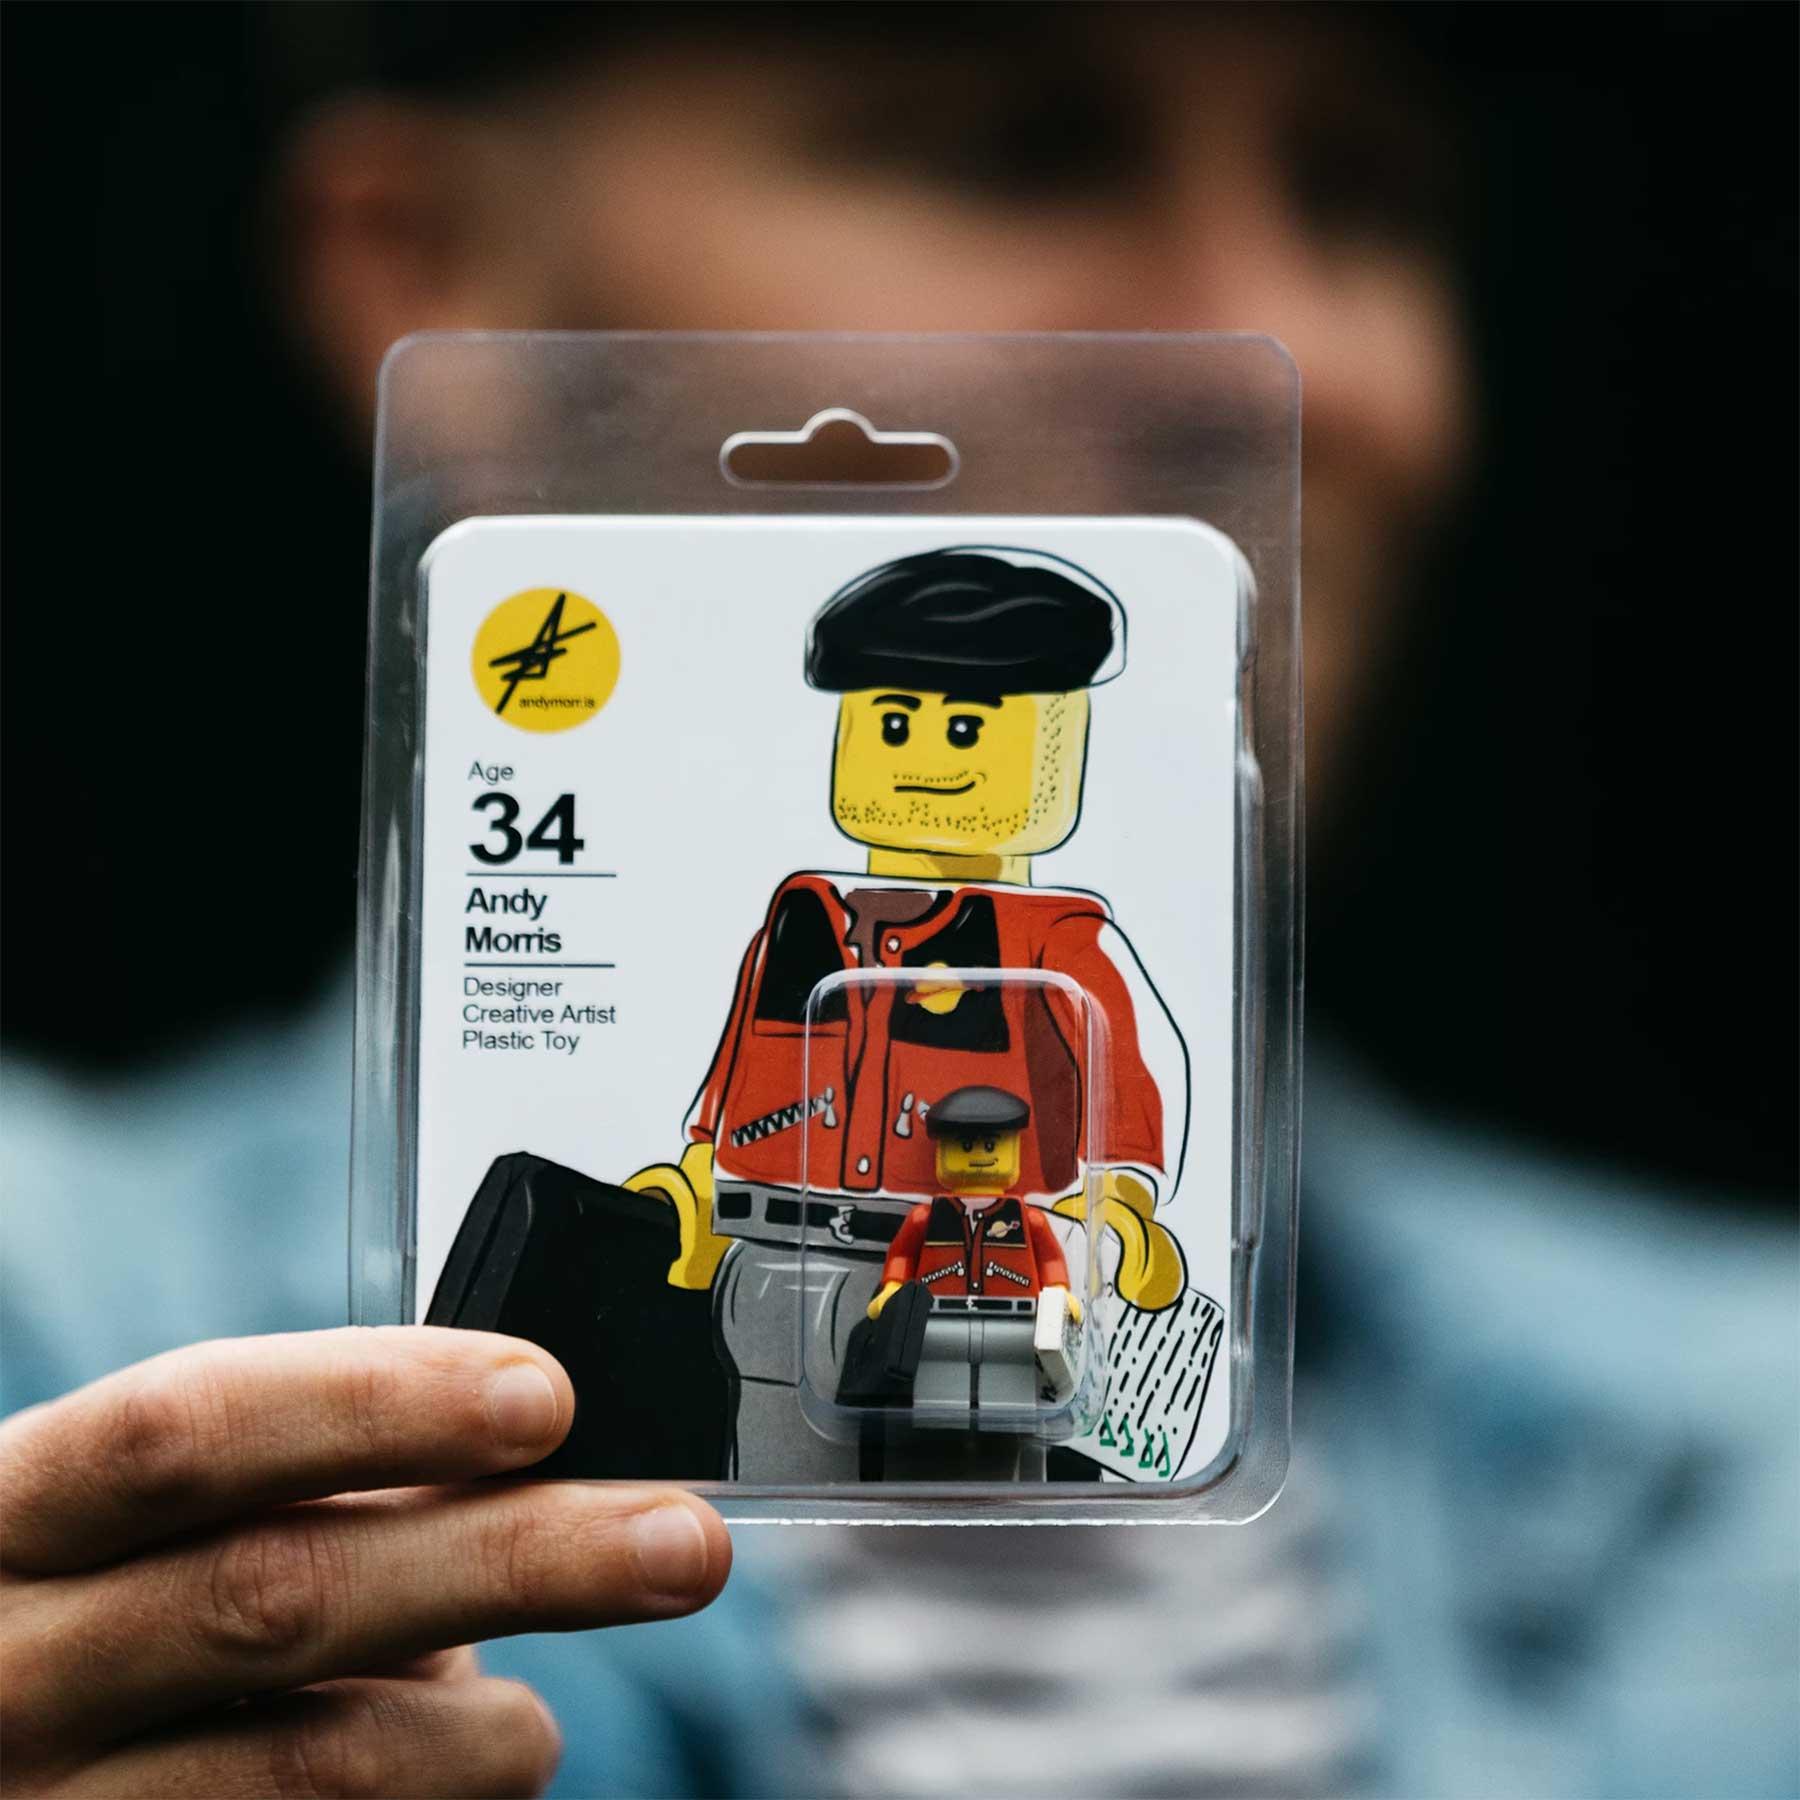 Bewerbung per LEGO-Minifigure Bewerbung-per-LEGOfigur_01